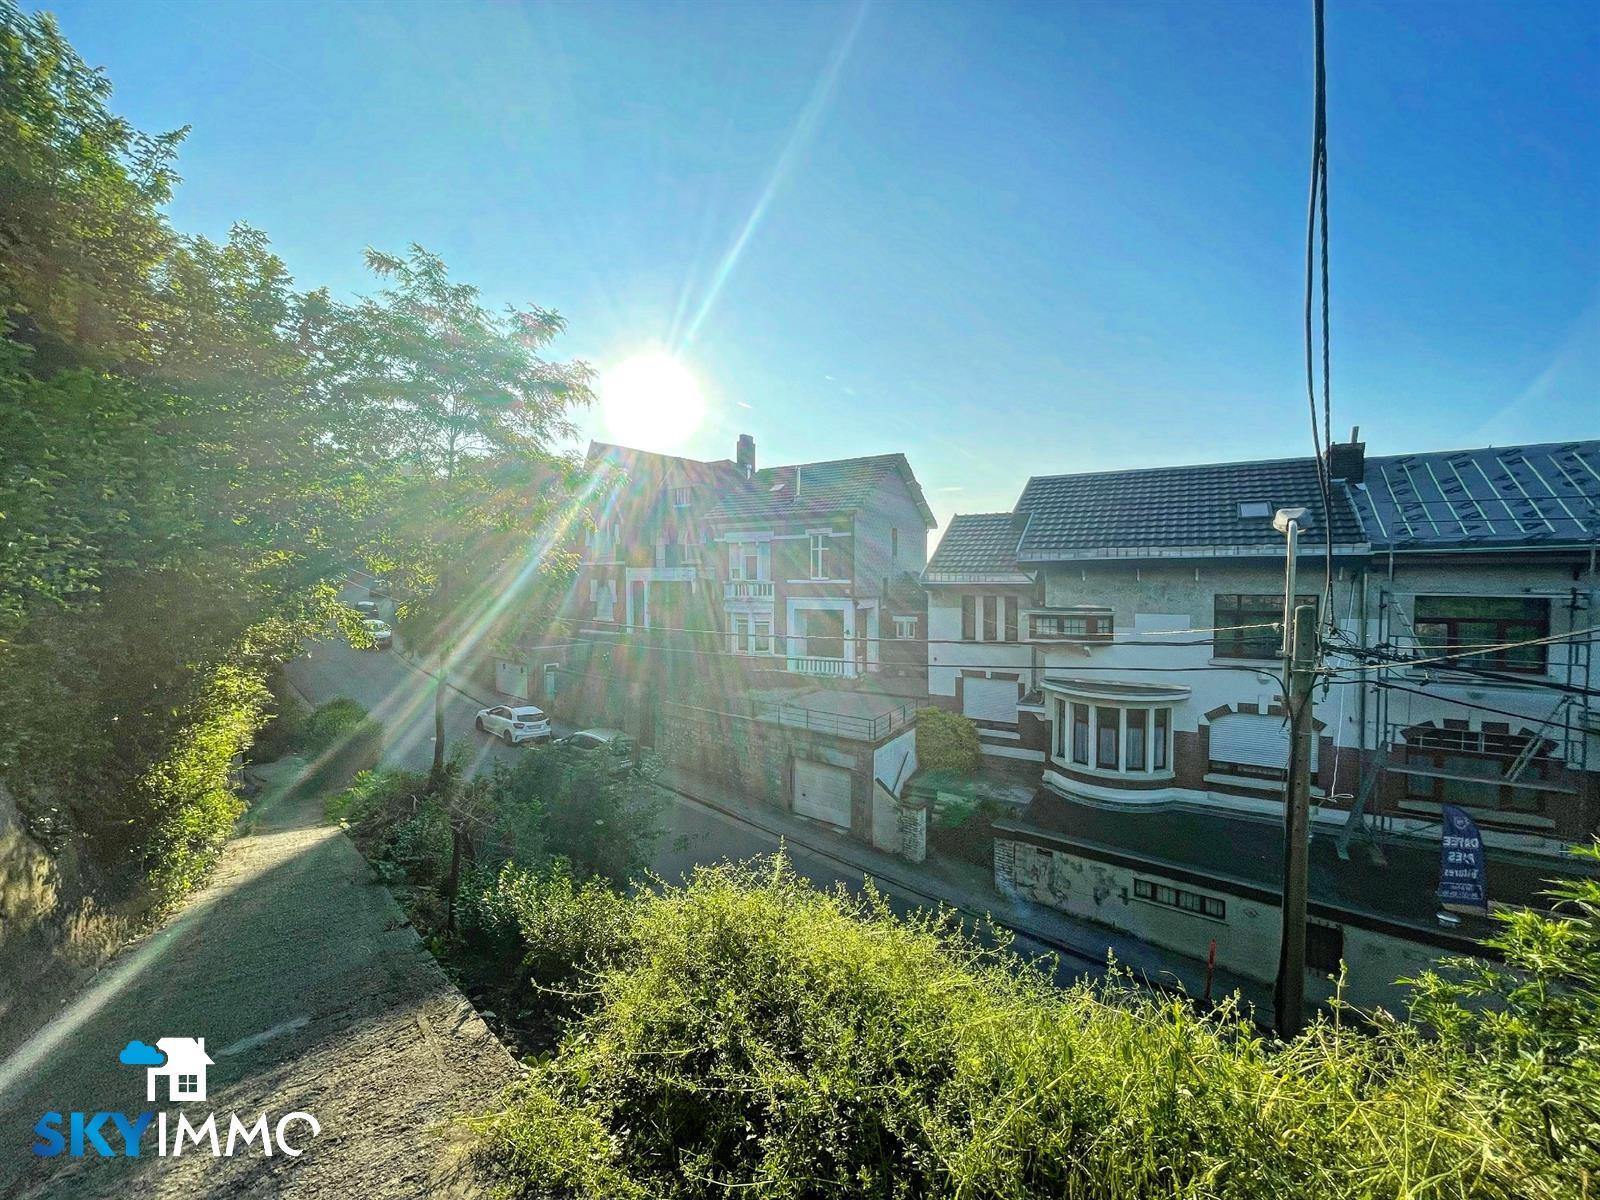 Maison - Seraing Jemeppesur-Meuse - #4383857-22